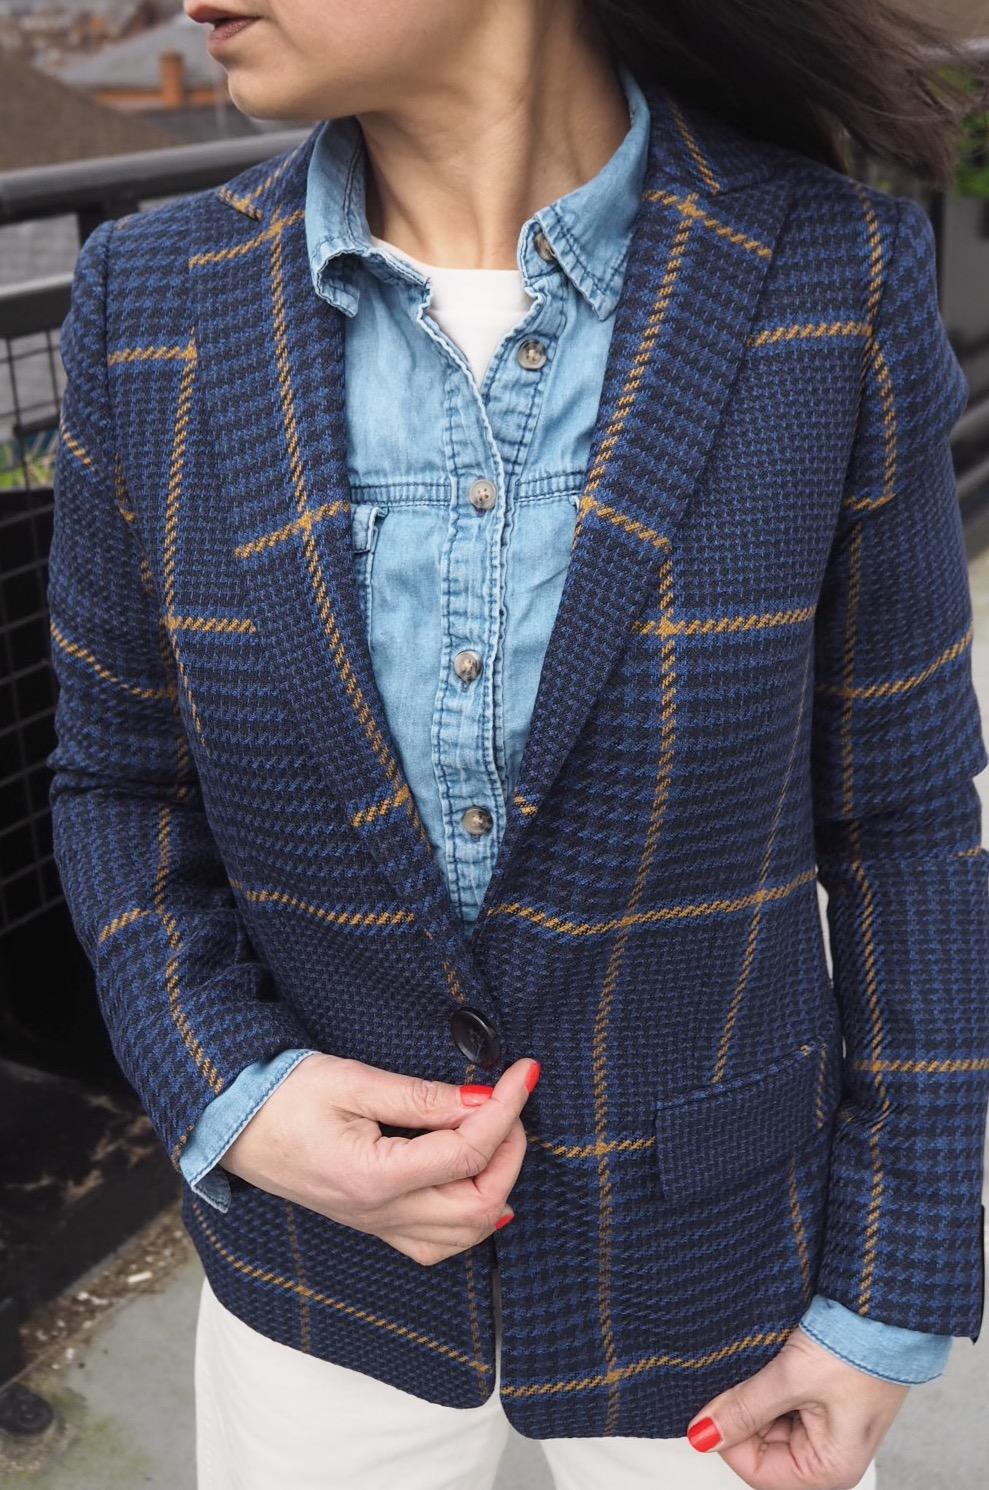 ...as it's Blue Check namesake... an altogether preferable fit!